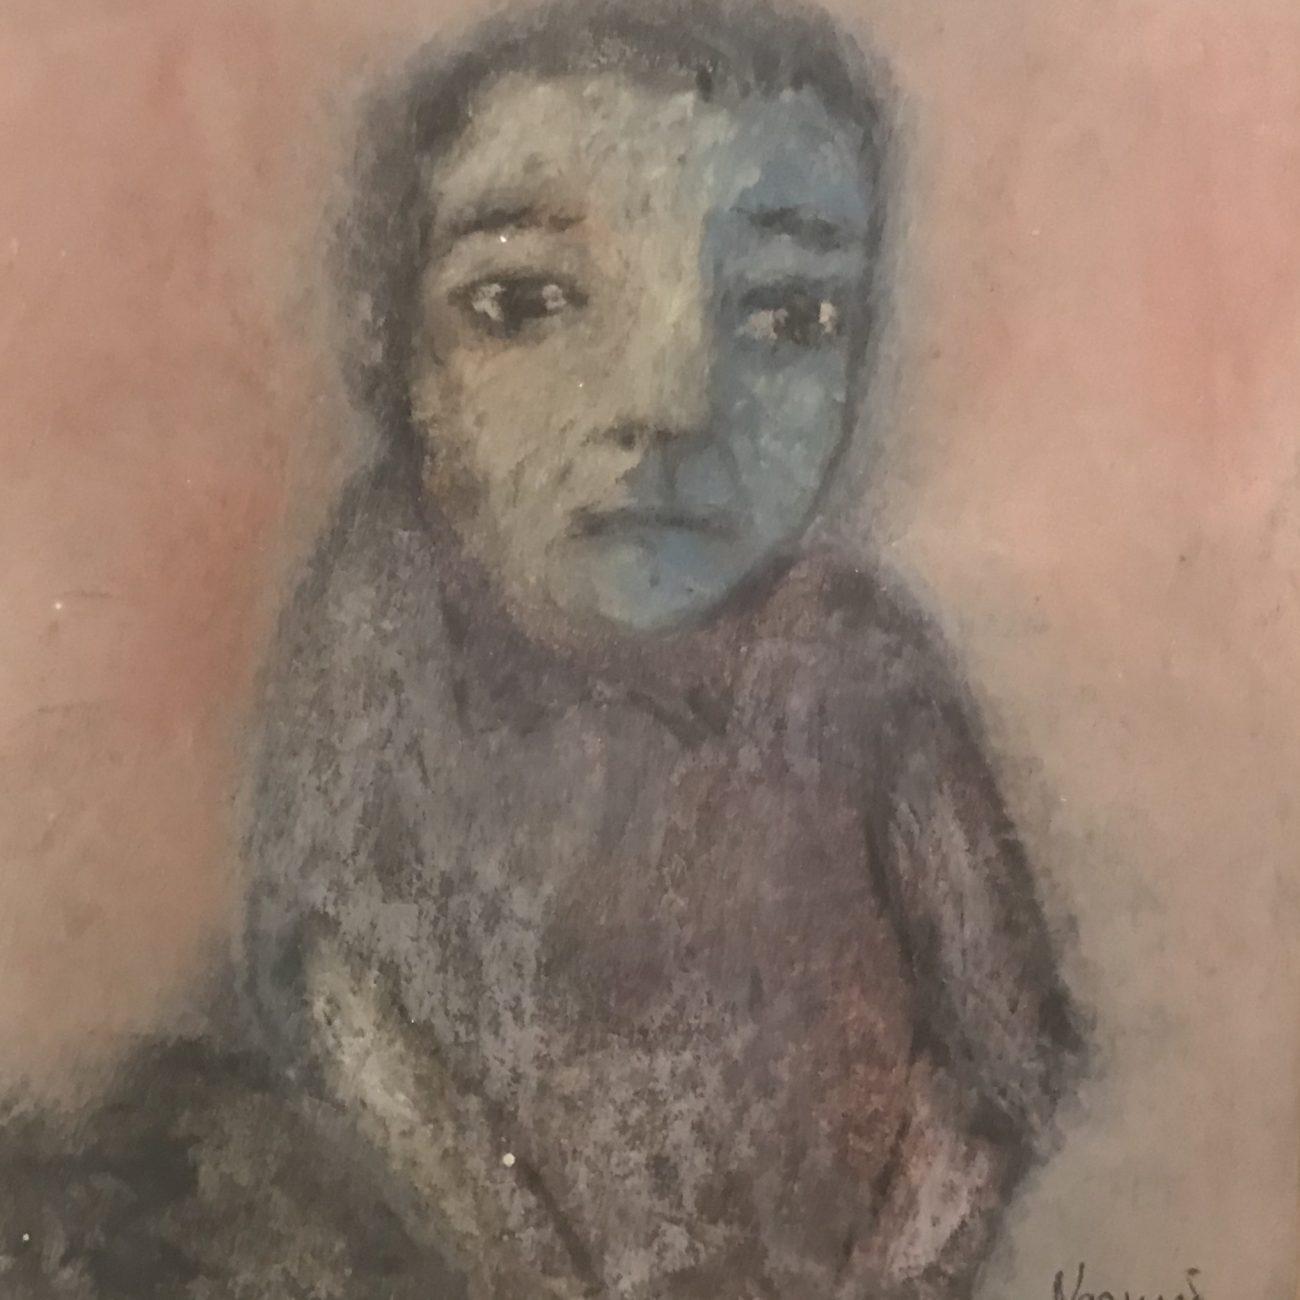 Nazmi Yılmaz  Teknik : Kağıt Üzeri Pastel Boya  Ölçü : 14 x 13 cm  Fiyat :1.180 TL